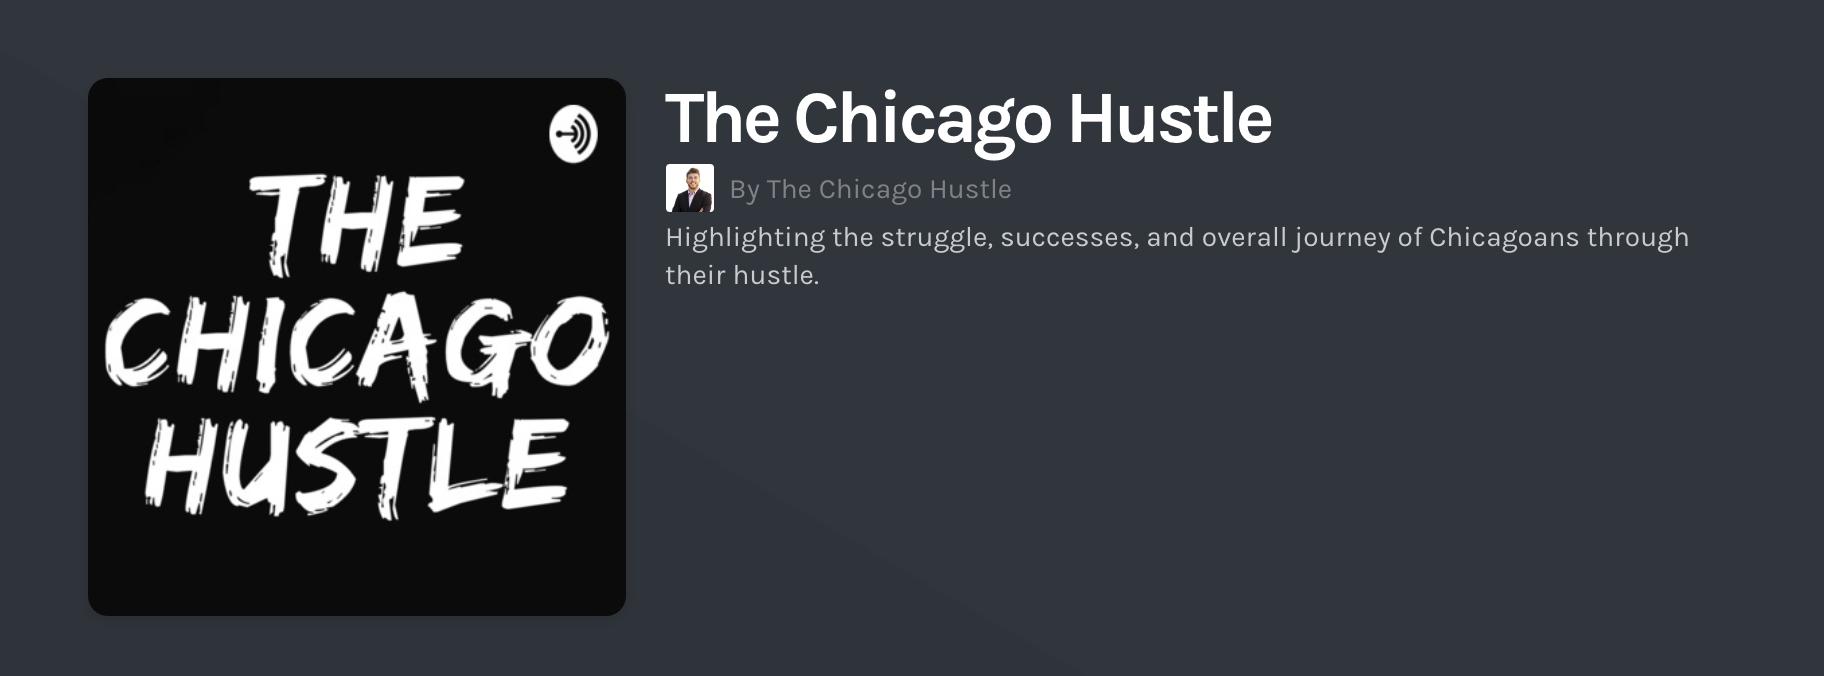 The Chicago Hustle Podcast